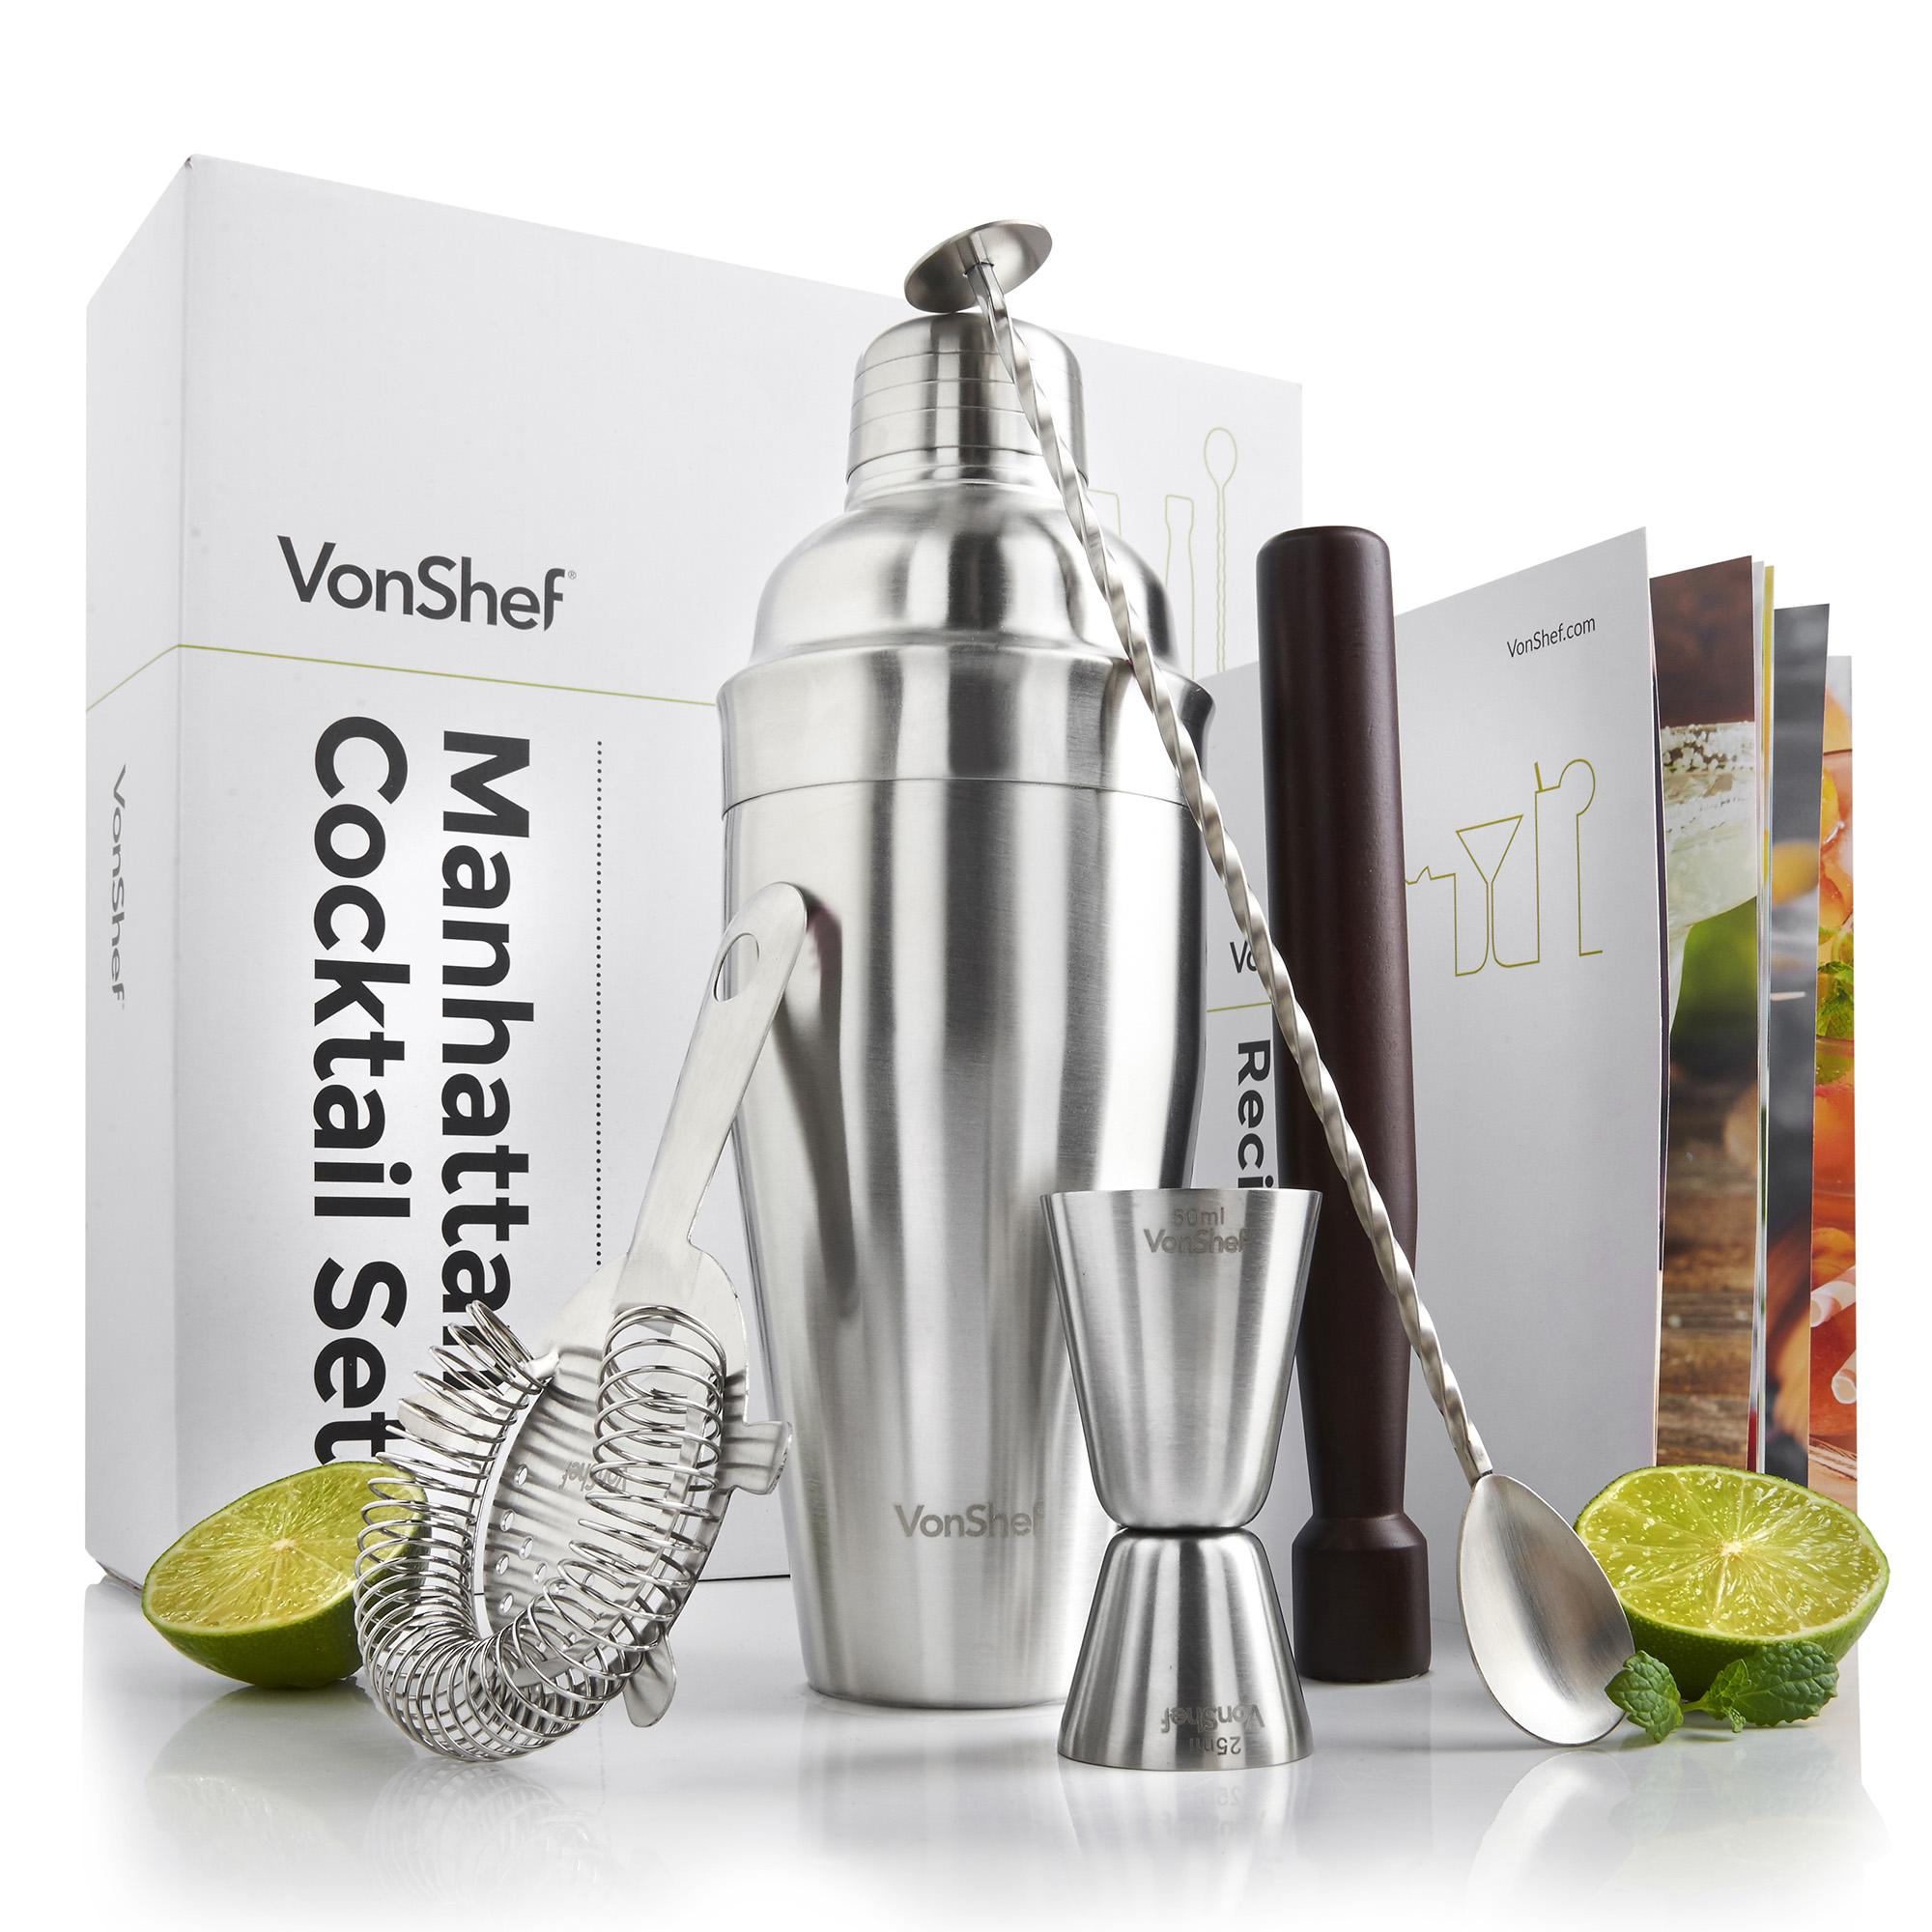 vonshef stainless steel manhattan cocktail shaker set gift box recipe guide ebay. Black Bedroom Furniture Sets. Home Design Ideas